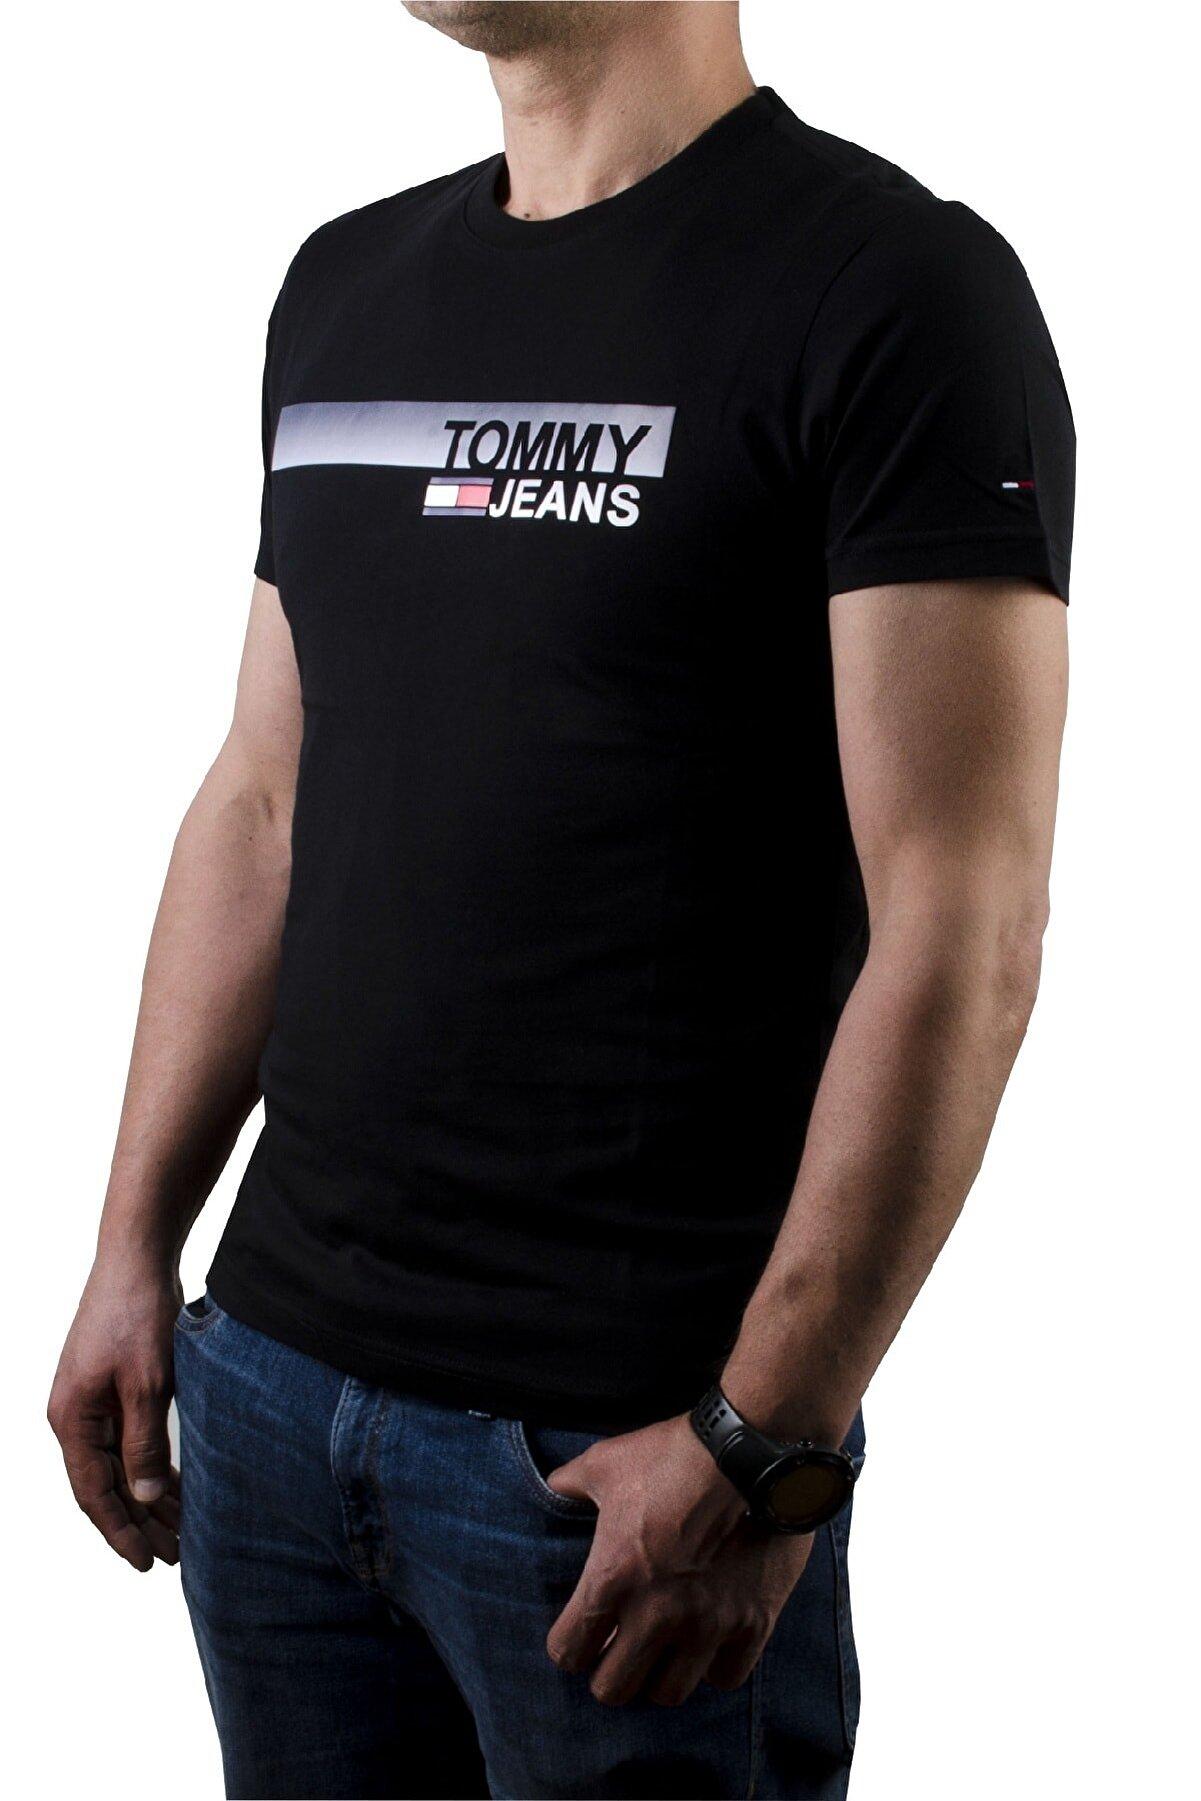 Tommy Hilfiger Erkek Essential Box Logo T-shirt Dm0dm06089